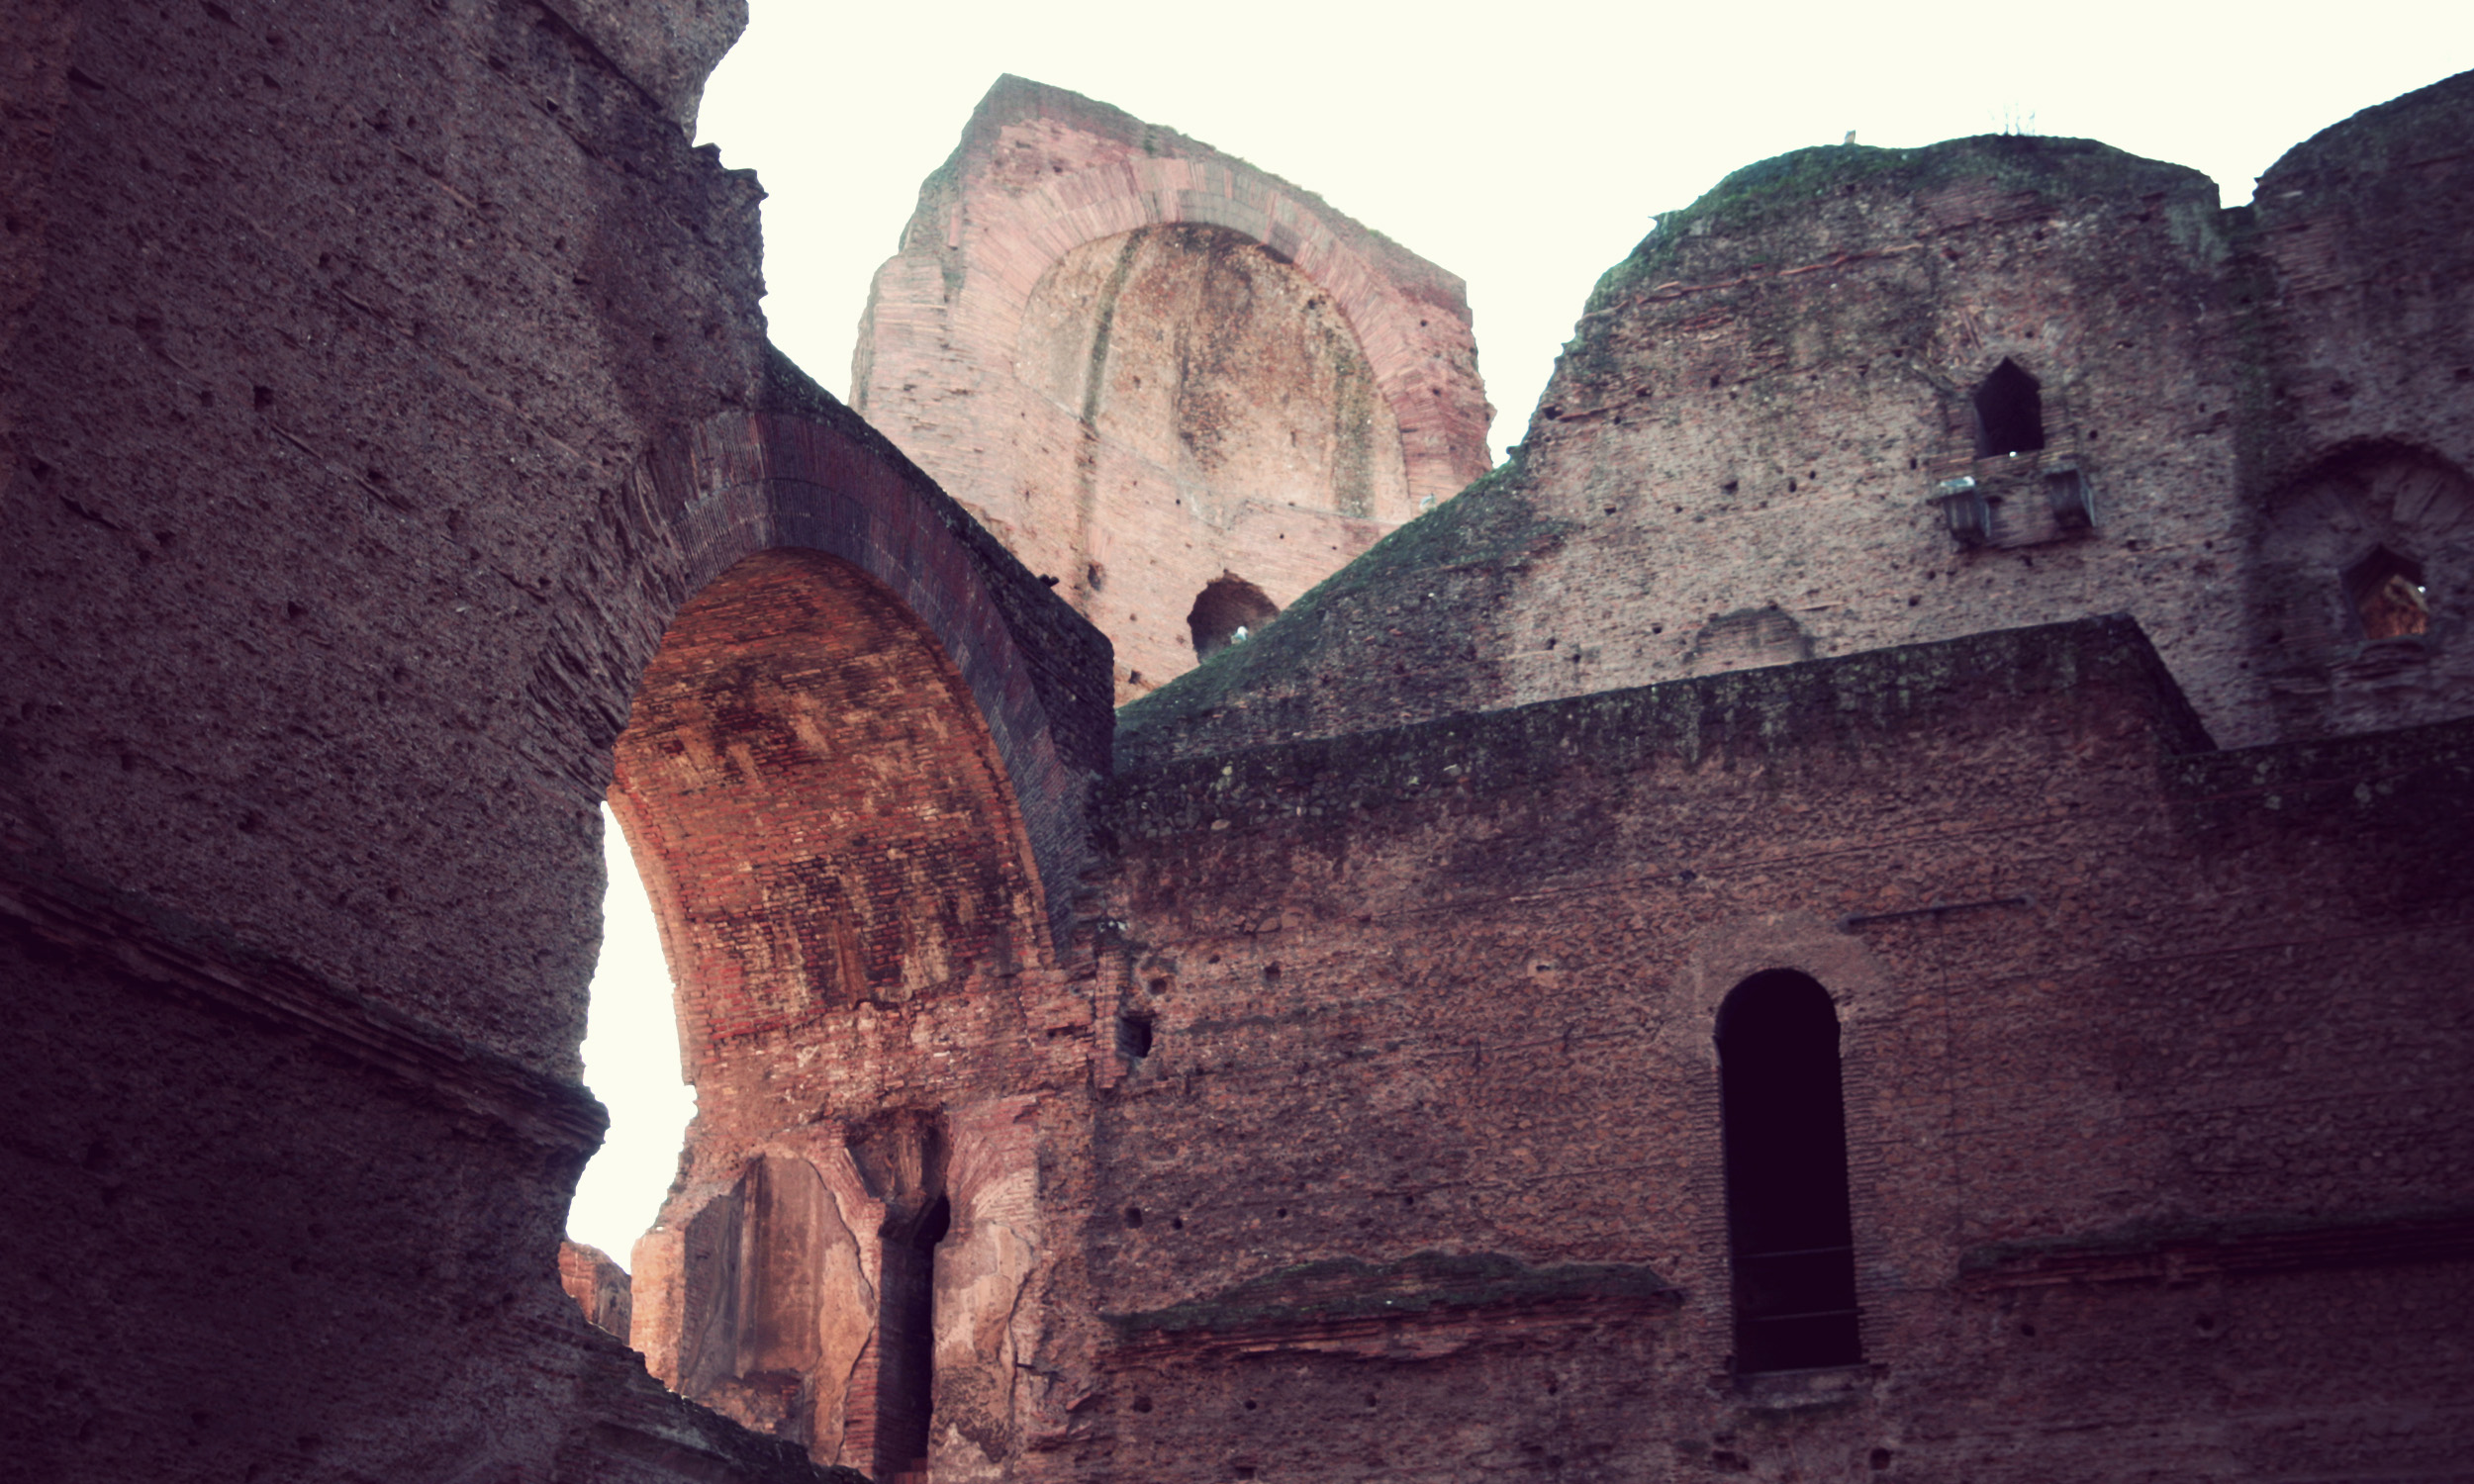 Baths-of-Caracalla_07.jpg